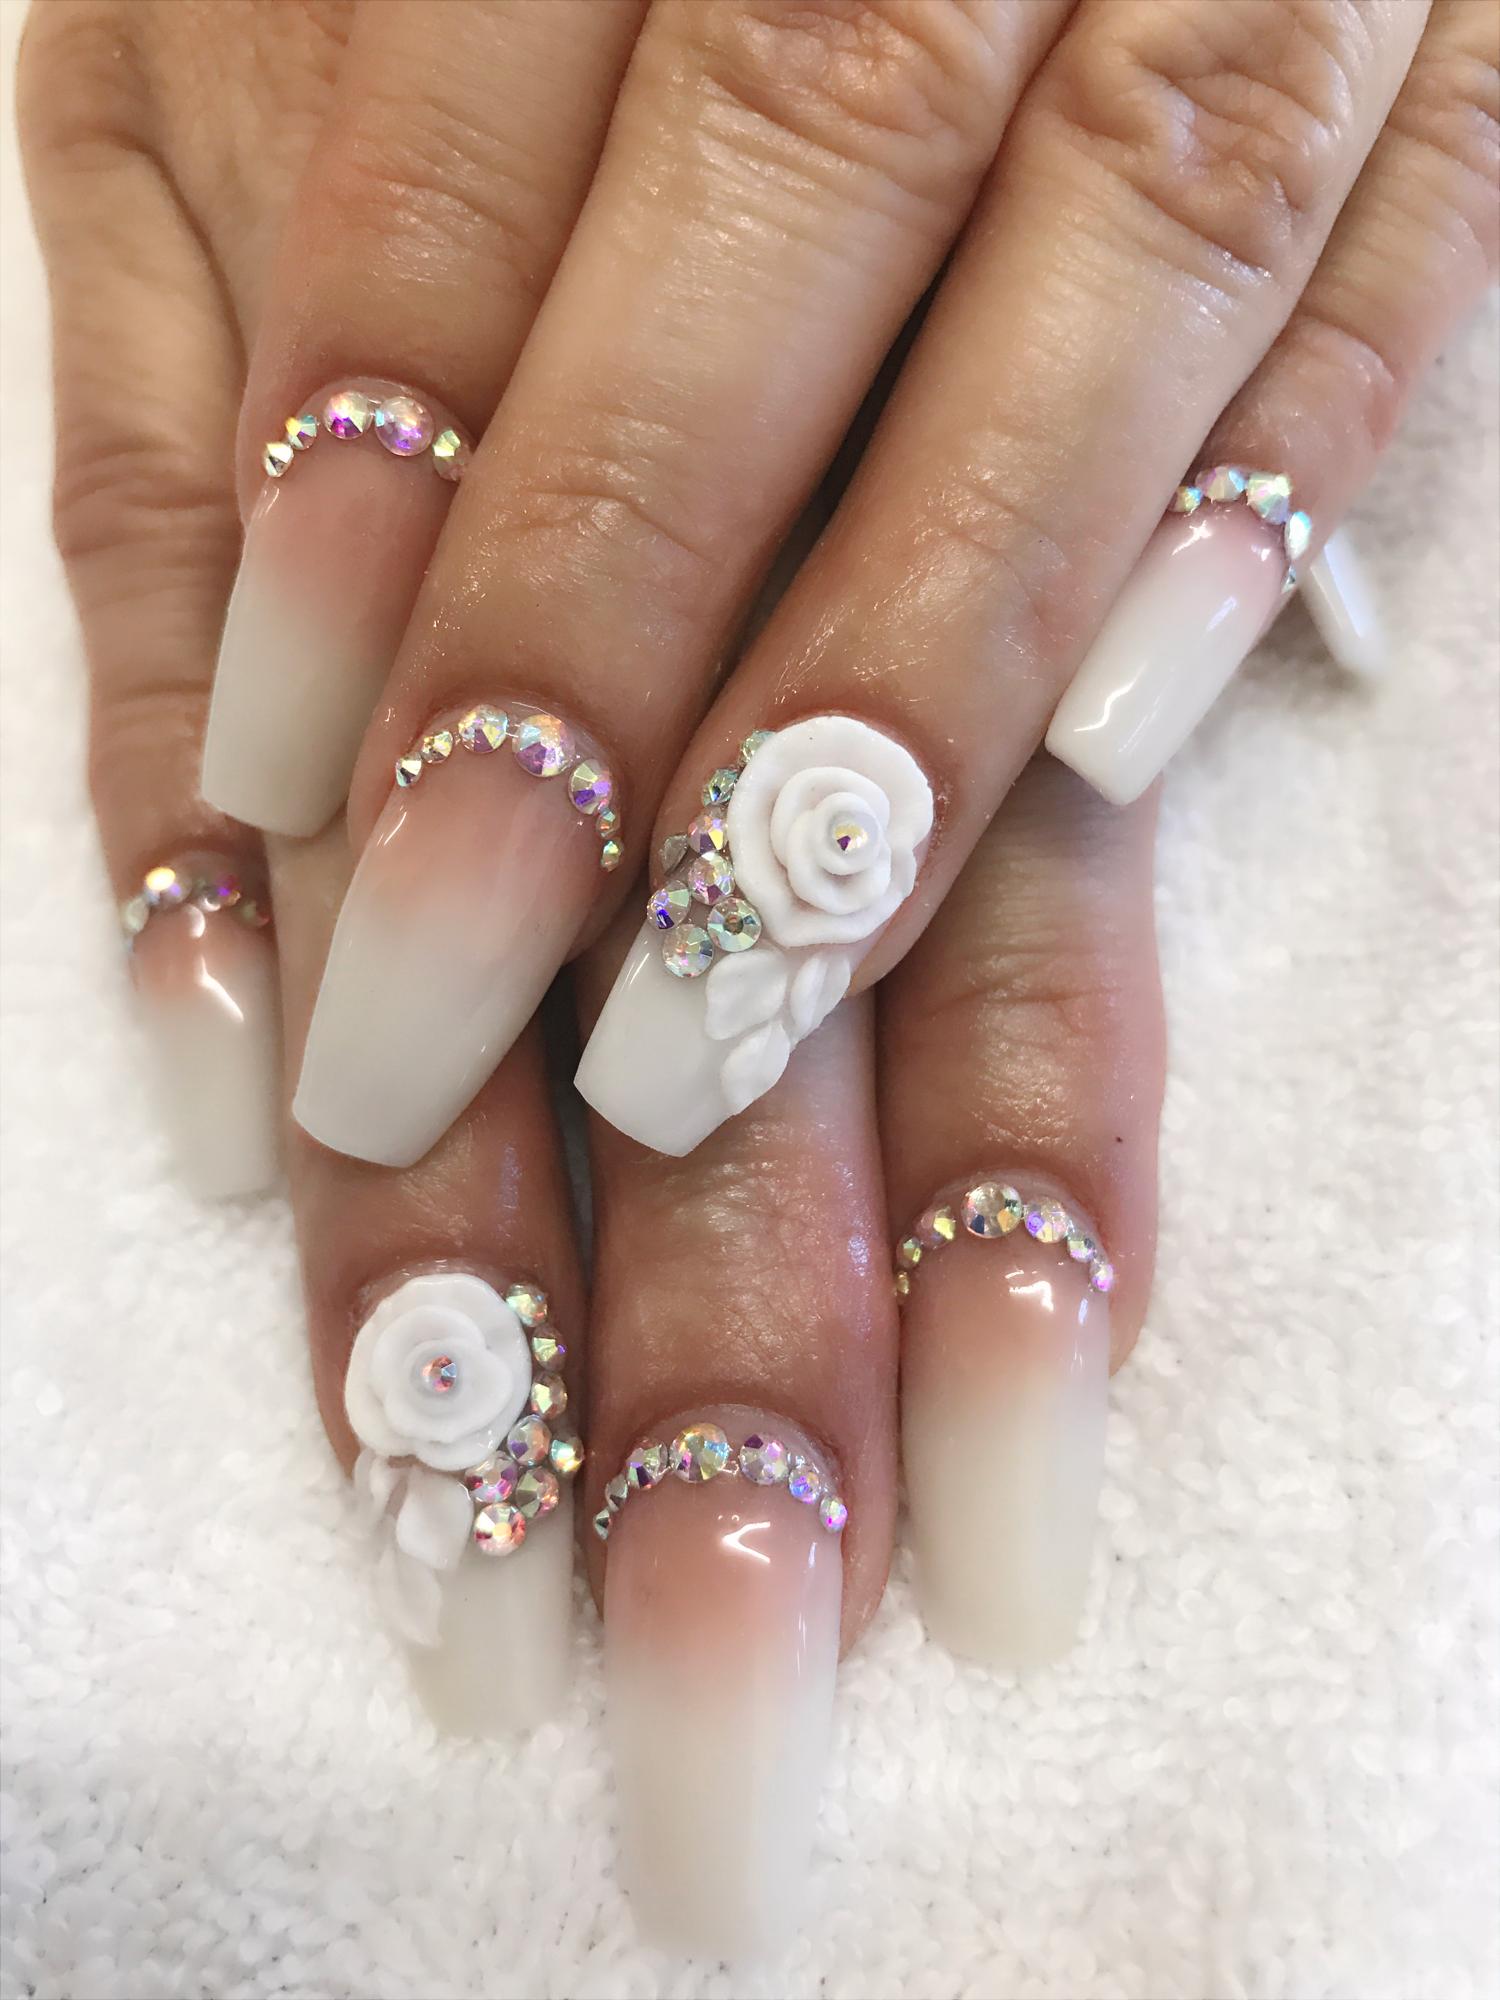 Wedding Nails 3D Rose Diamond White Nude Hombre Color Powder